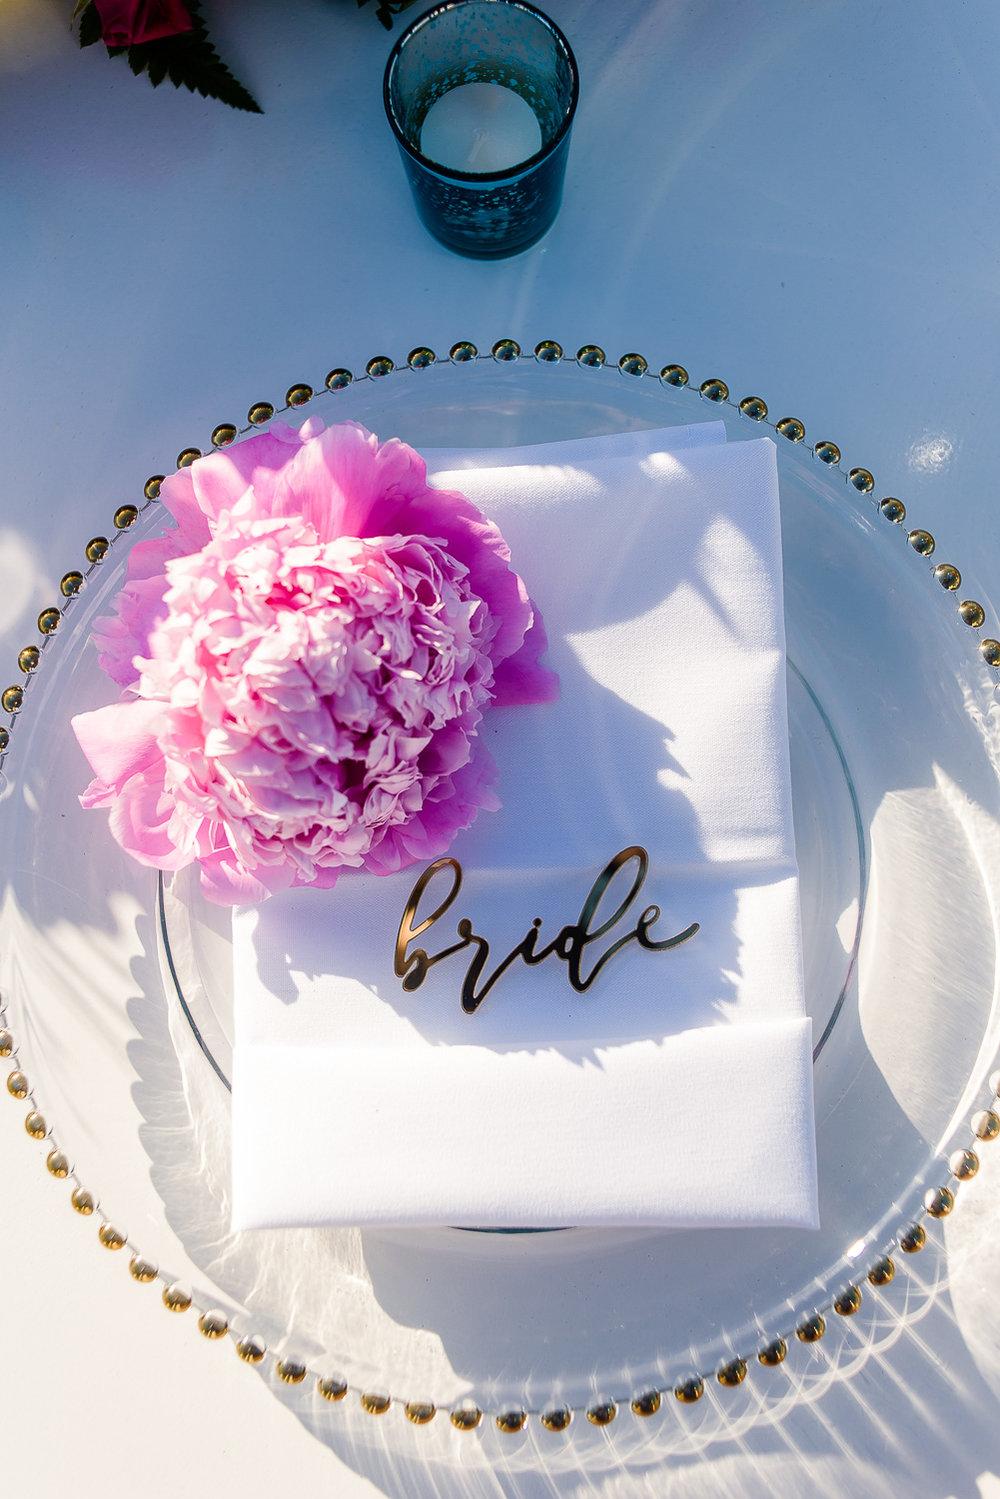 Wedding decor details, bride sign